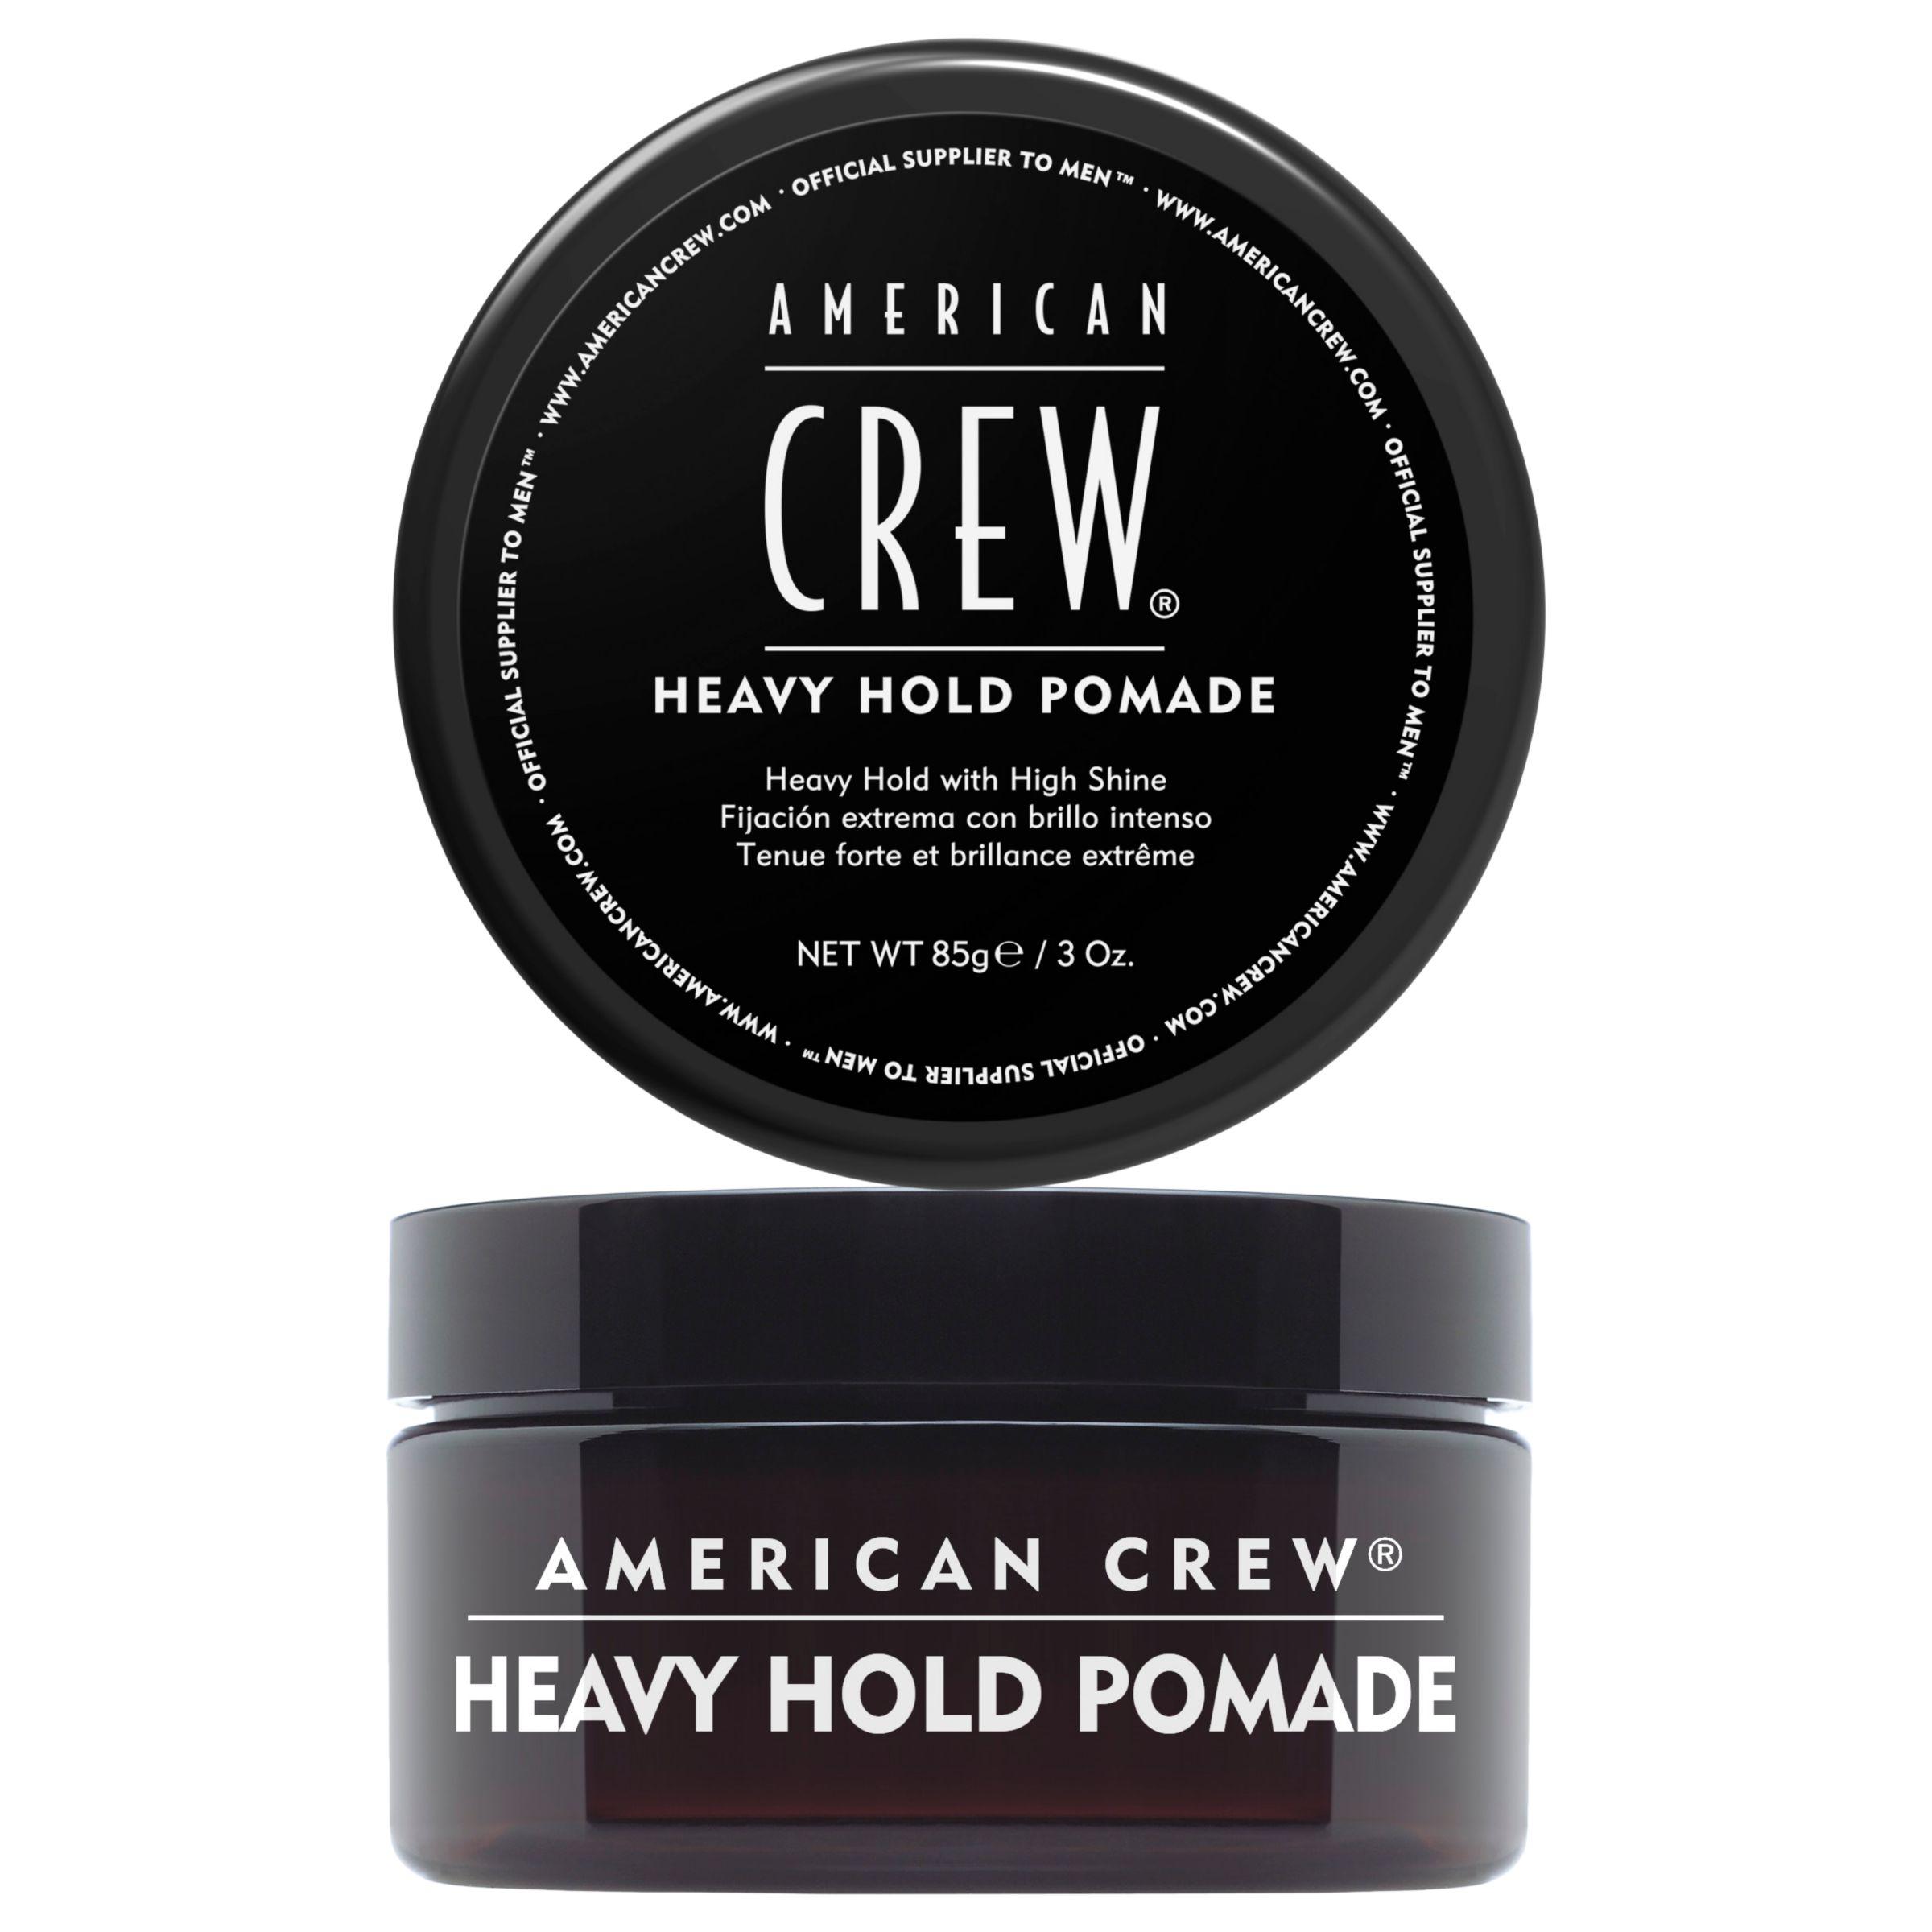 American Crew American Crew Heavy Hold Pomade, 85g